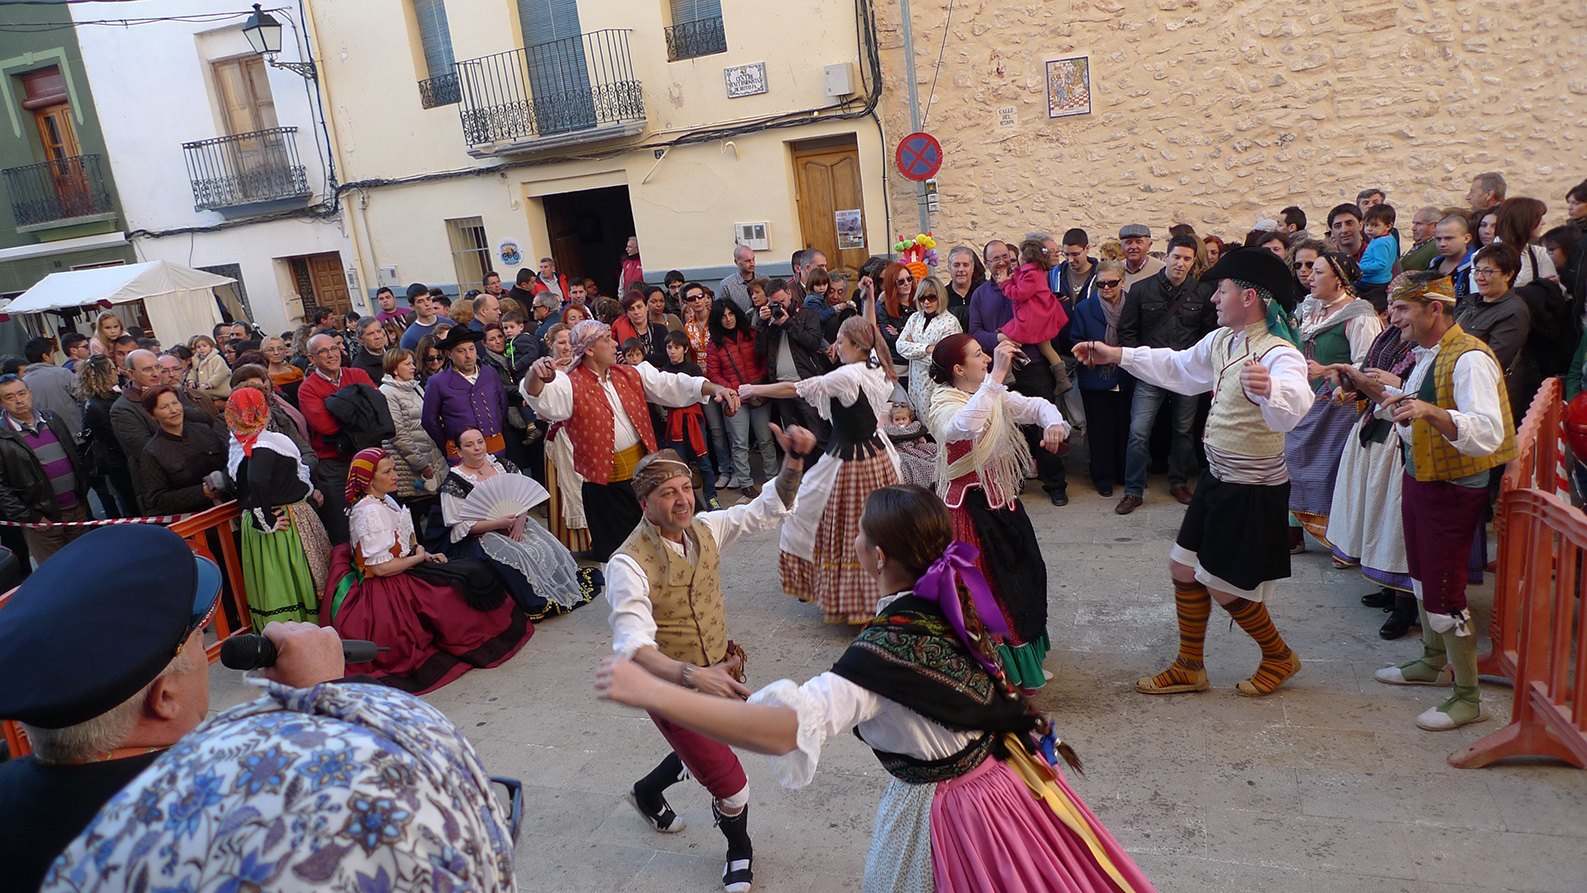 2014-02-23 - Baladre a Fira St. Marcia-ROTOVA (143)